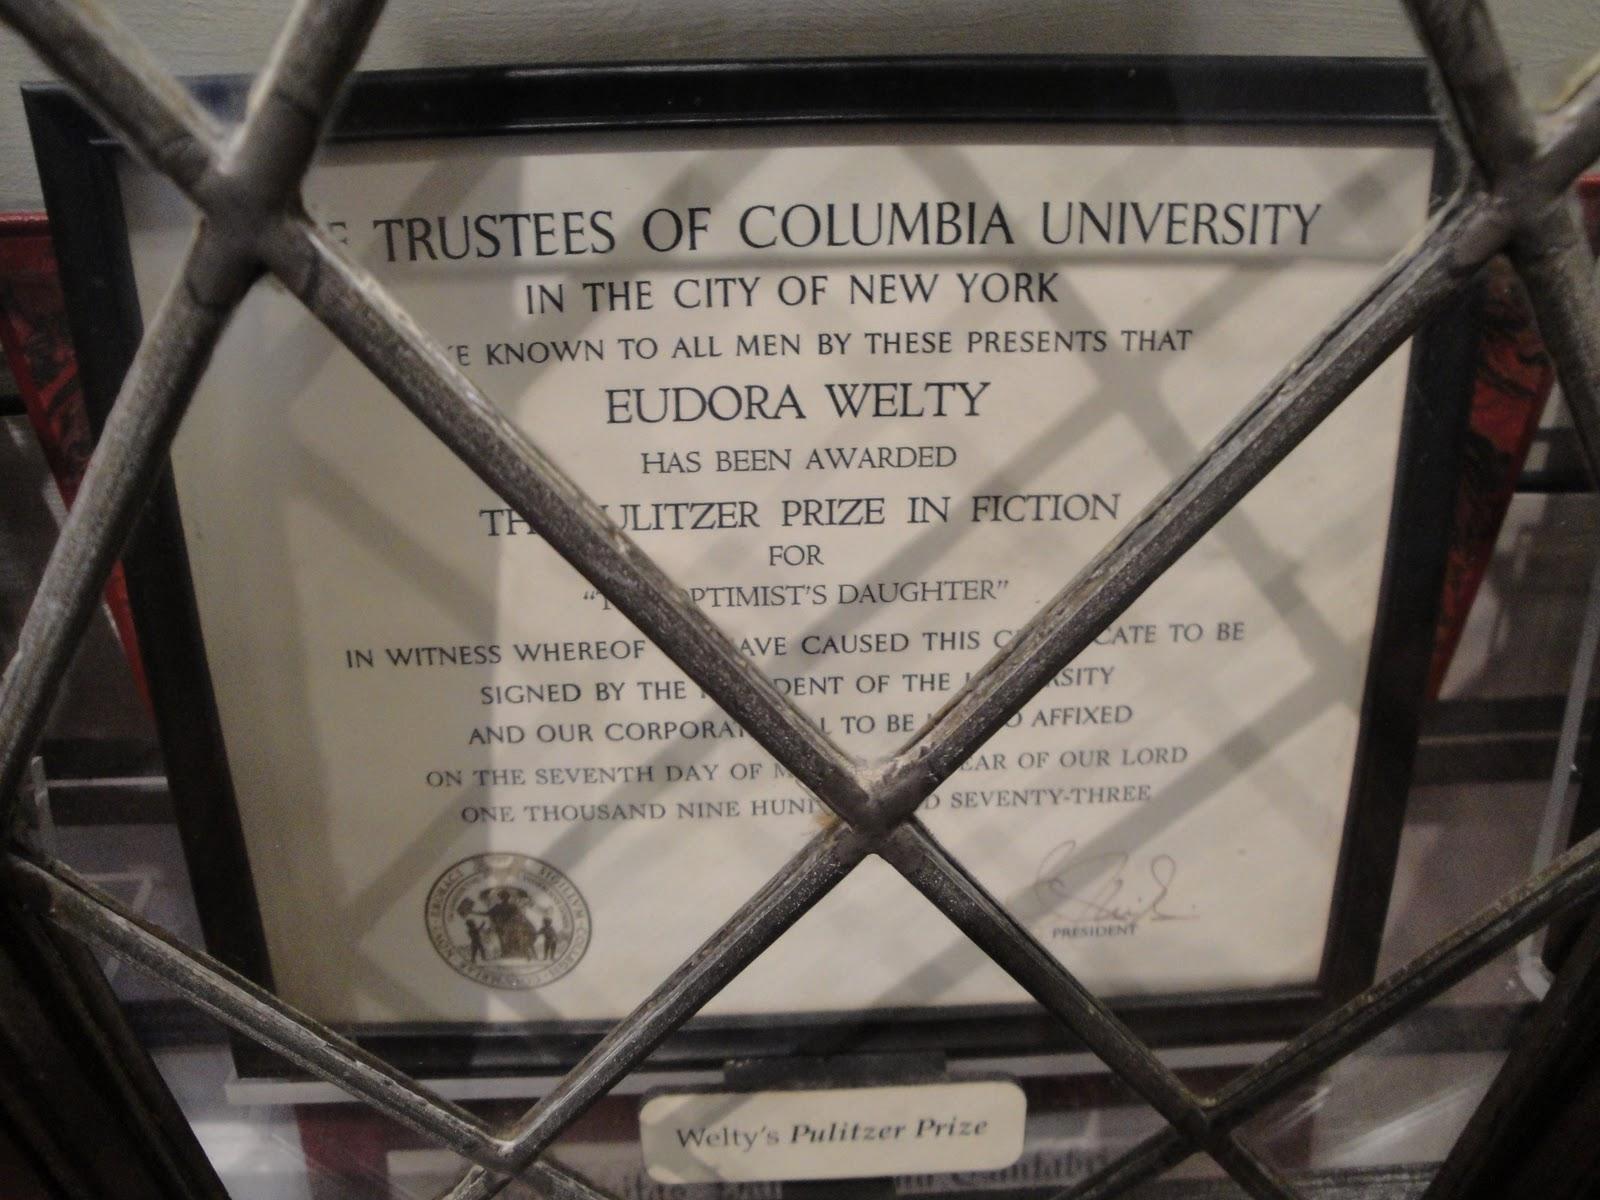 Eudora Welty's Pulitzer Prize.